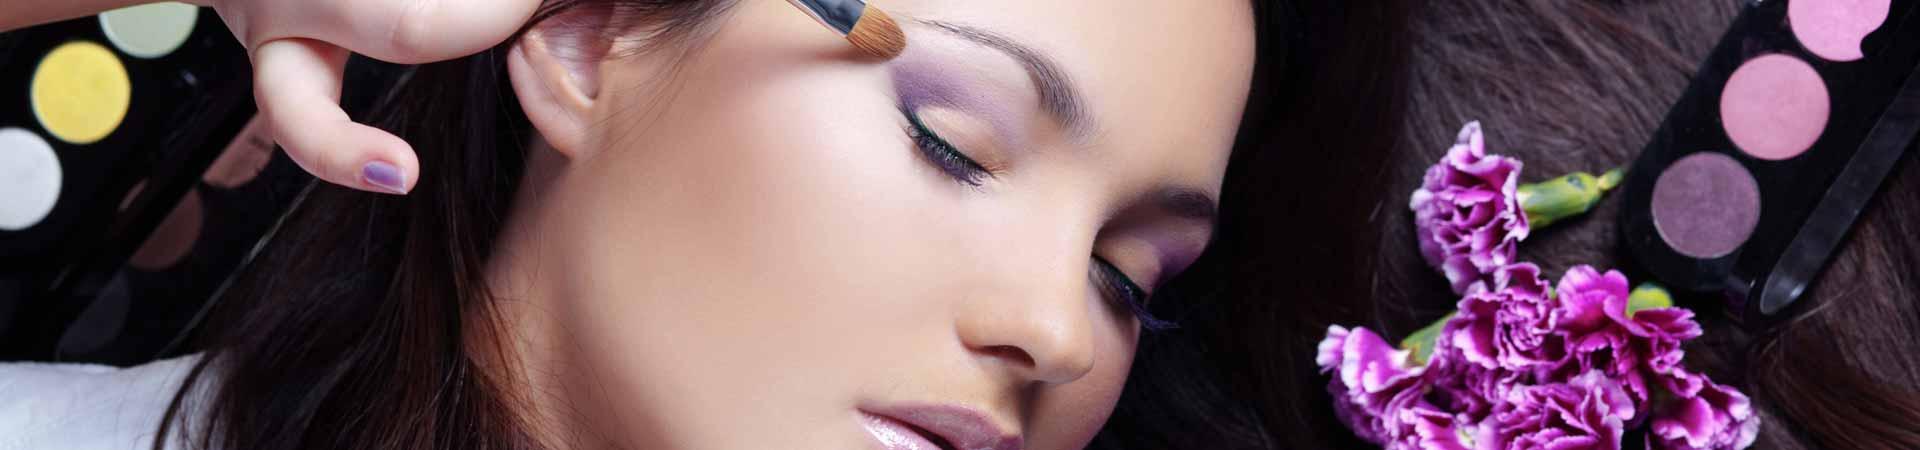 https://www.goodmorningtenerife.com/wp-content/uploads/2015/07/01_slide_perfumeria-lis-1920x450-1.jpg